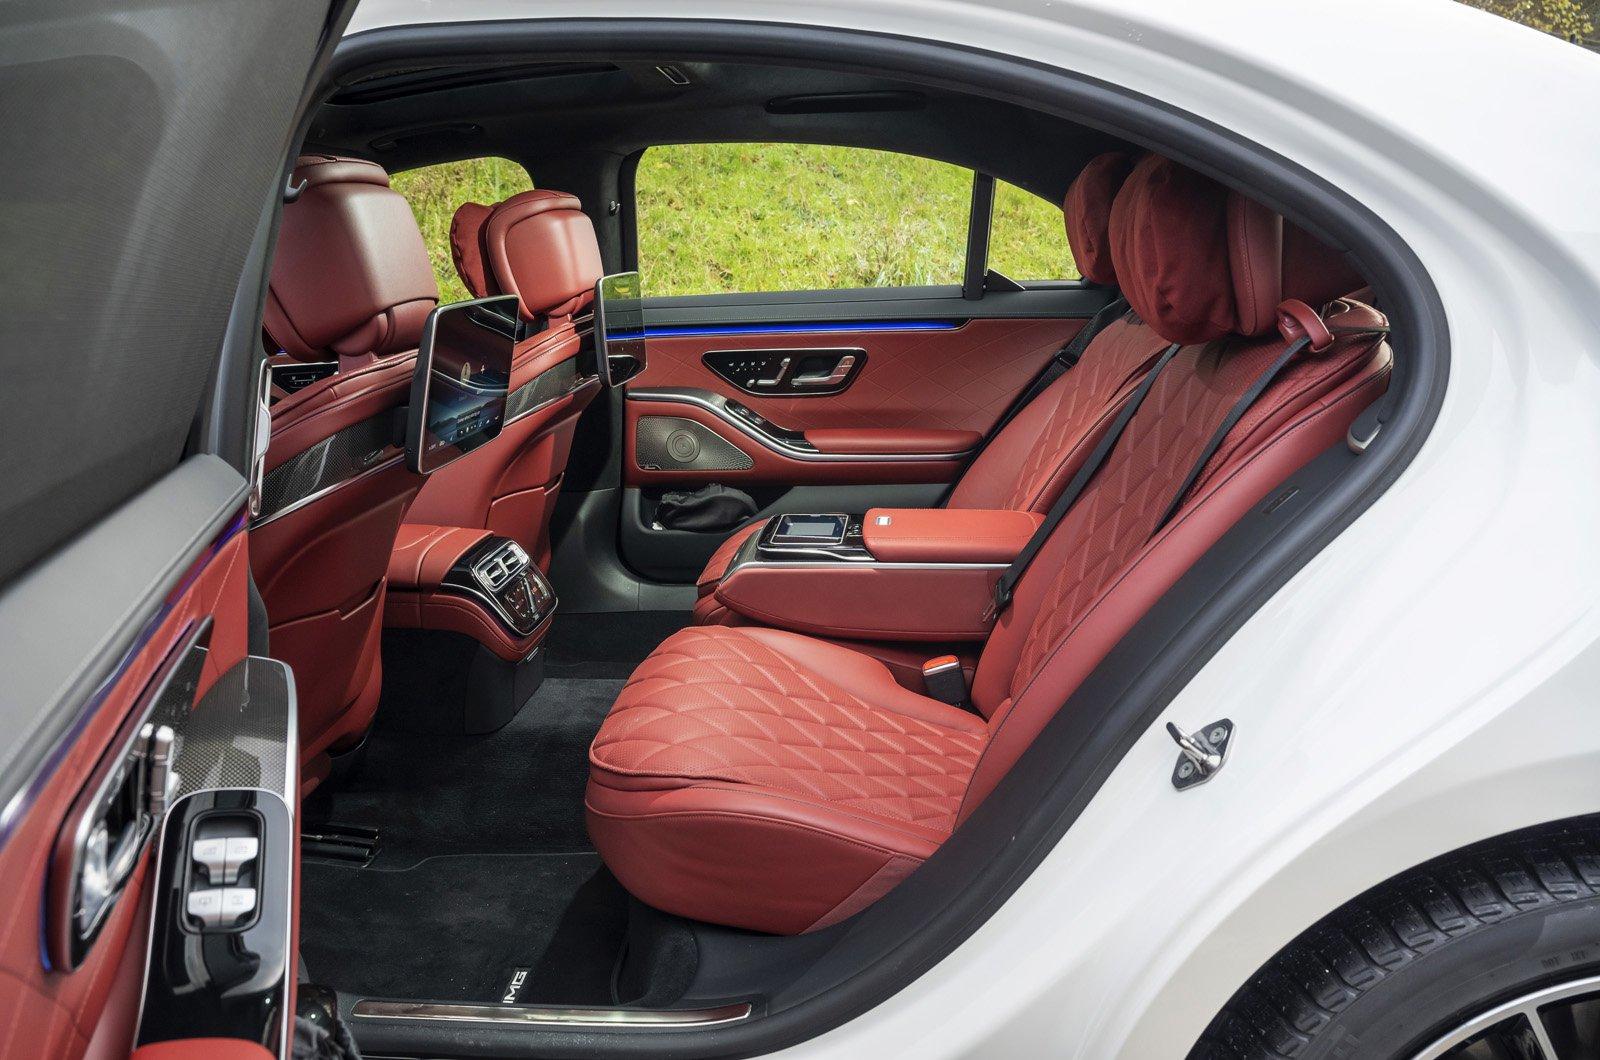 Mercedes S-Class 2021 rear seats